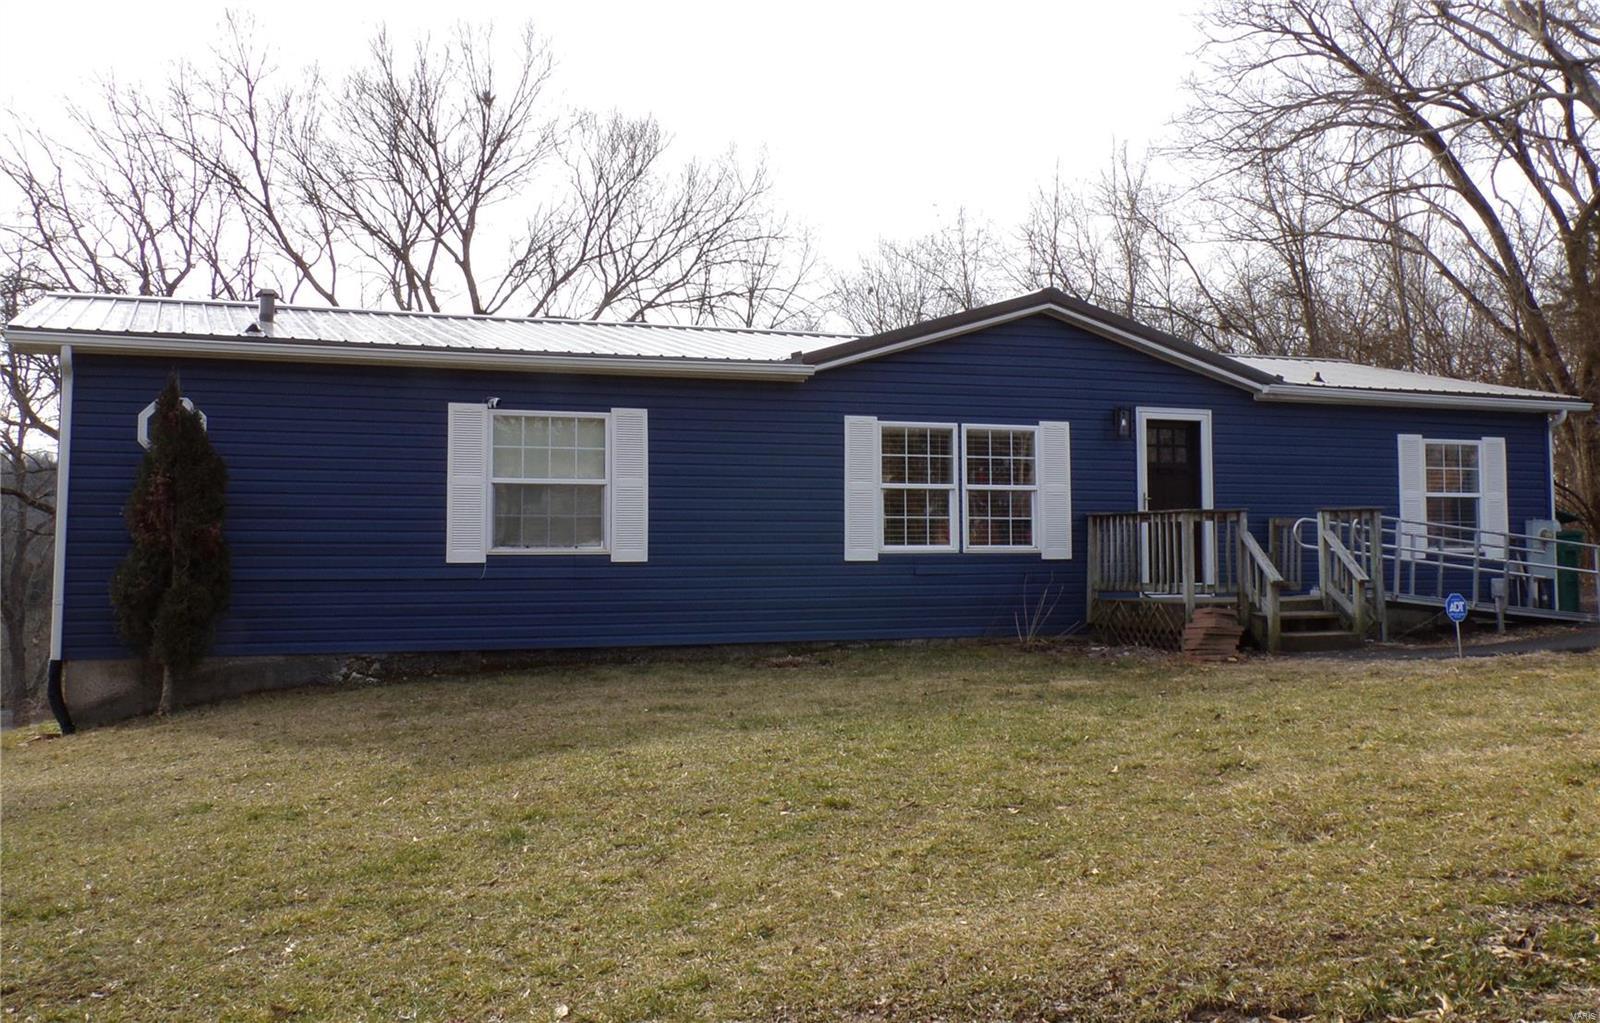 232 Kronos Property Photo - De Soto, MO real estate listing